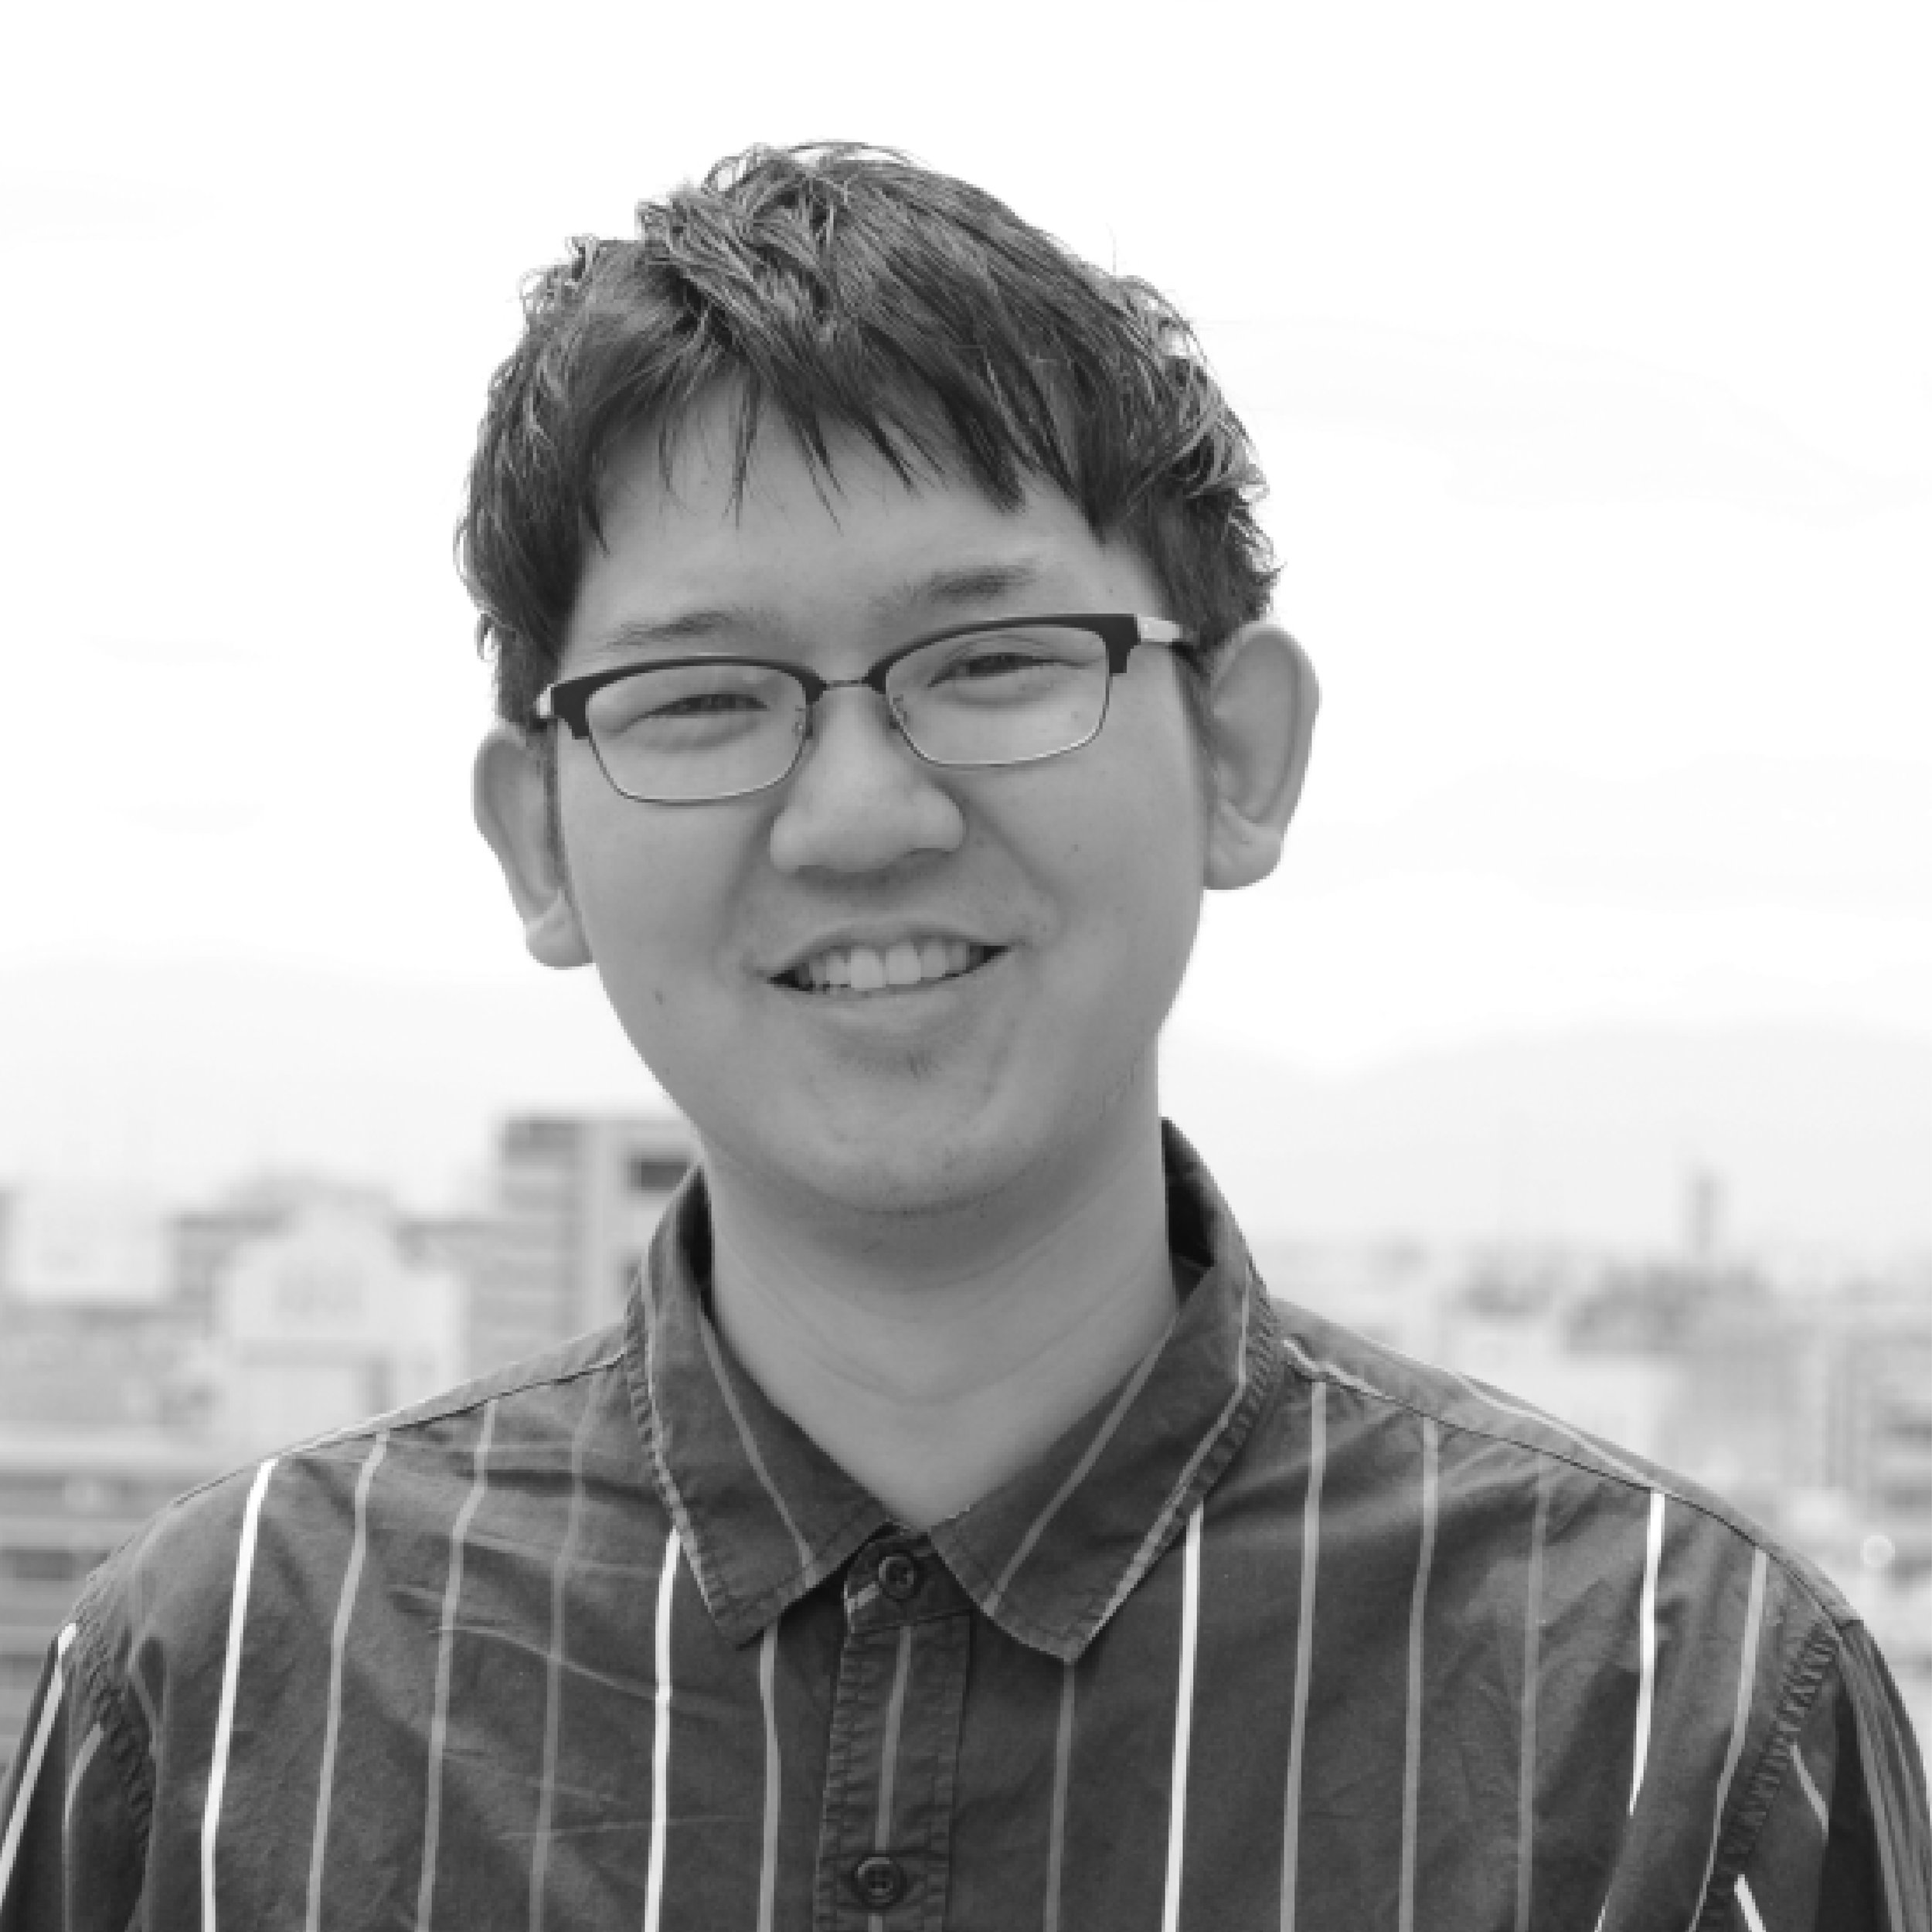 Tetsuta Onishi